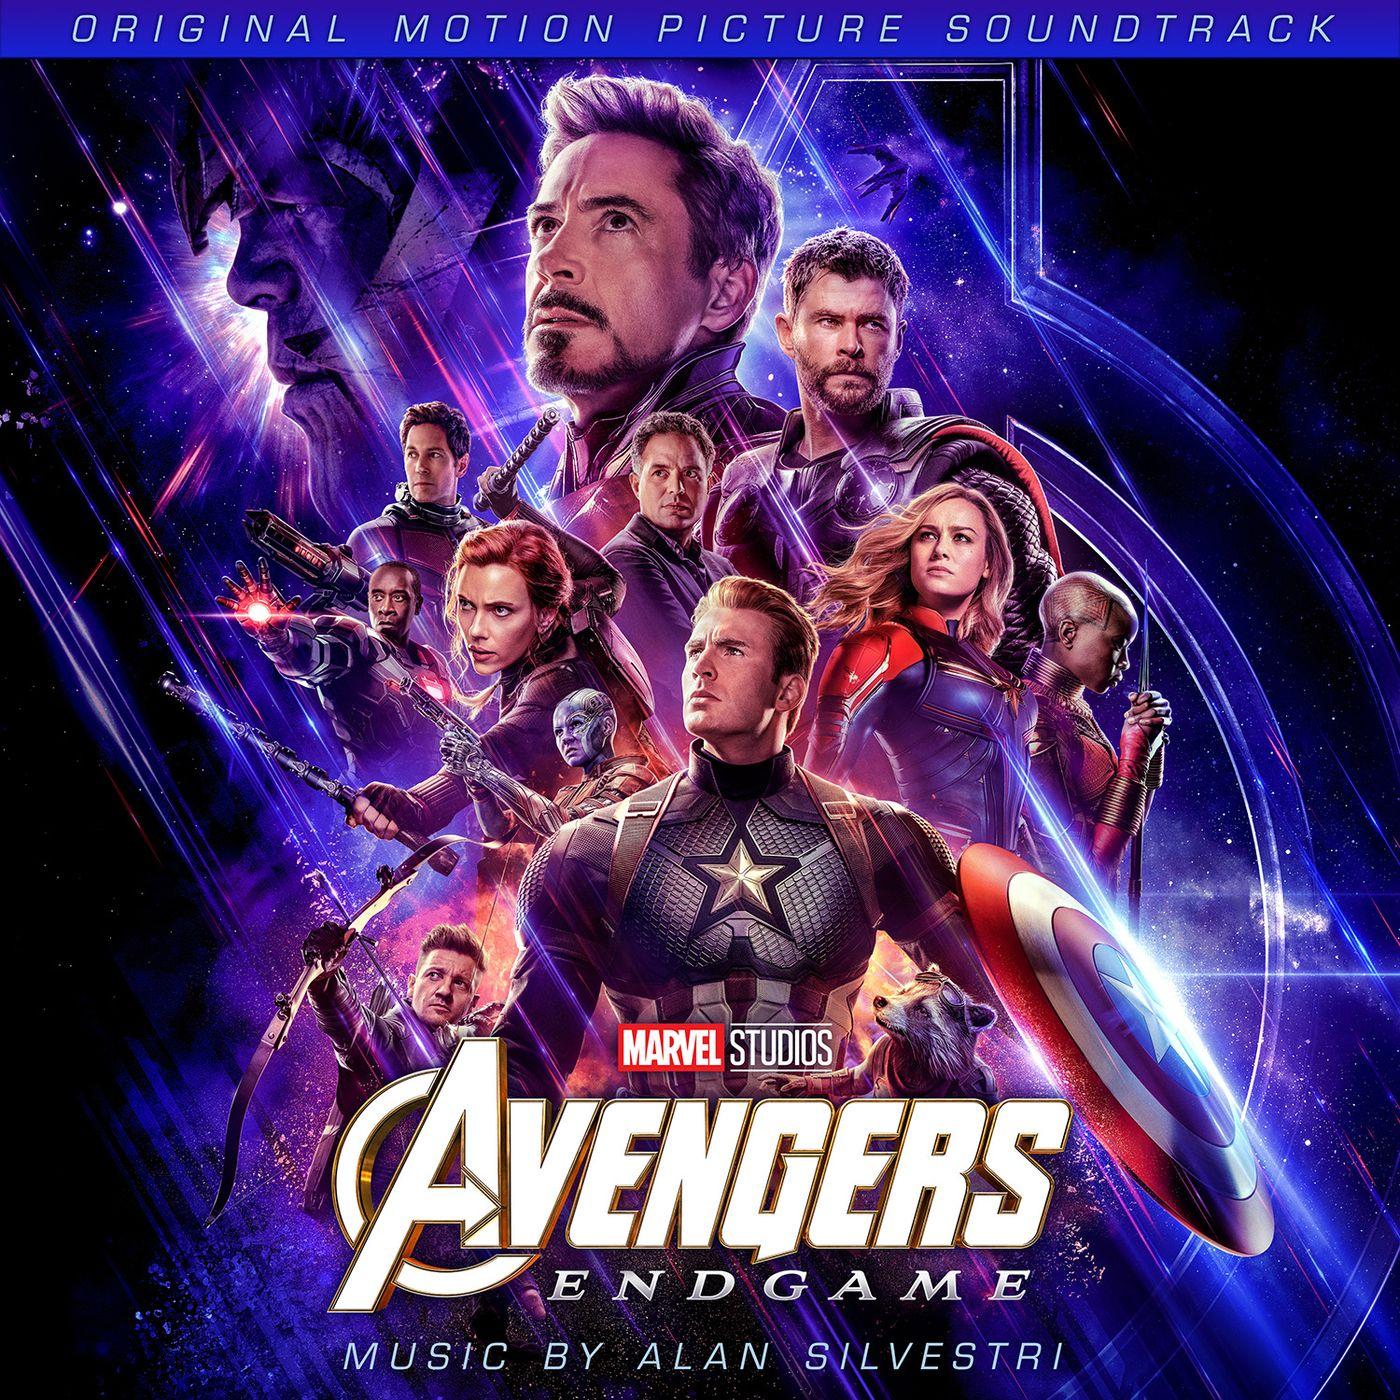 6. Avengers: Endgame / Top 5 Superhero Scores